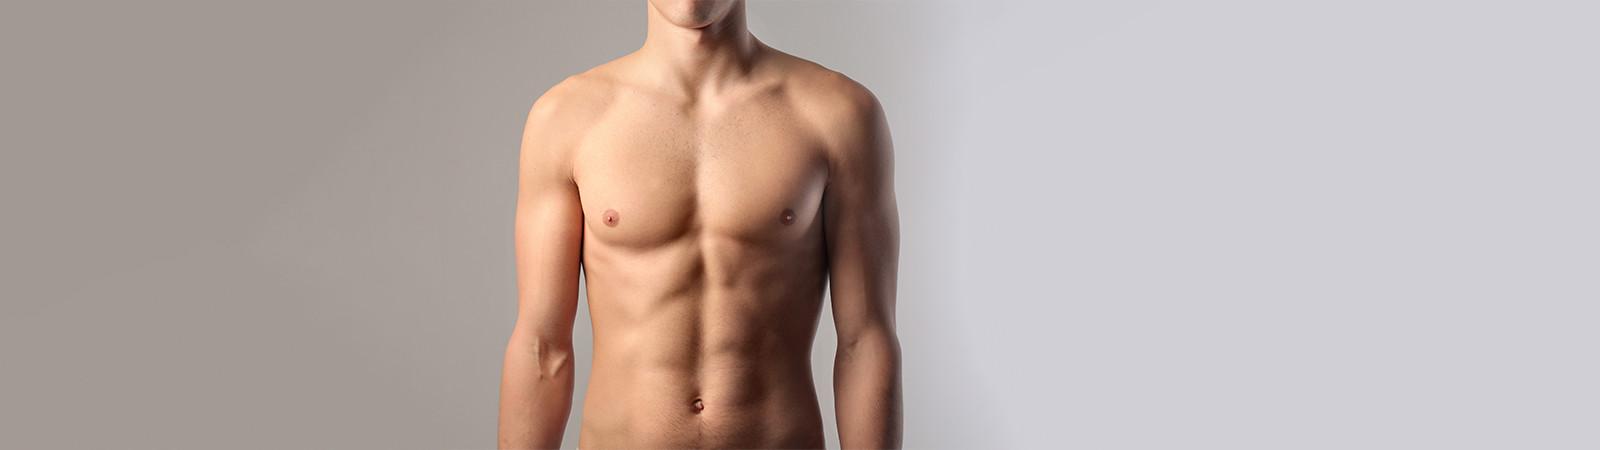 Kryolipolyse, Eis gegen Fettpolster für Männer - Dr. Armin Rau